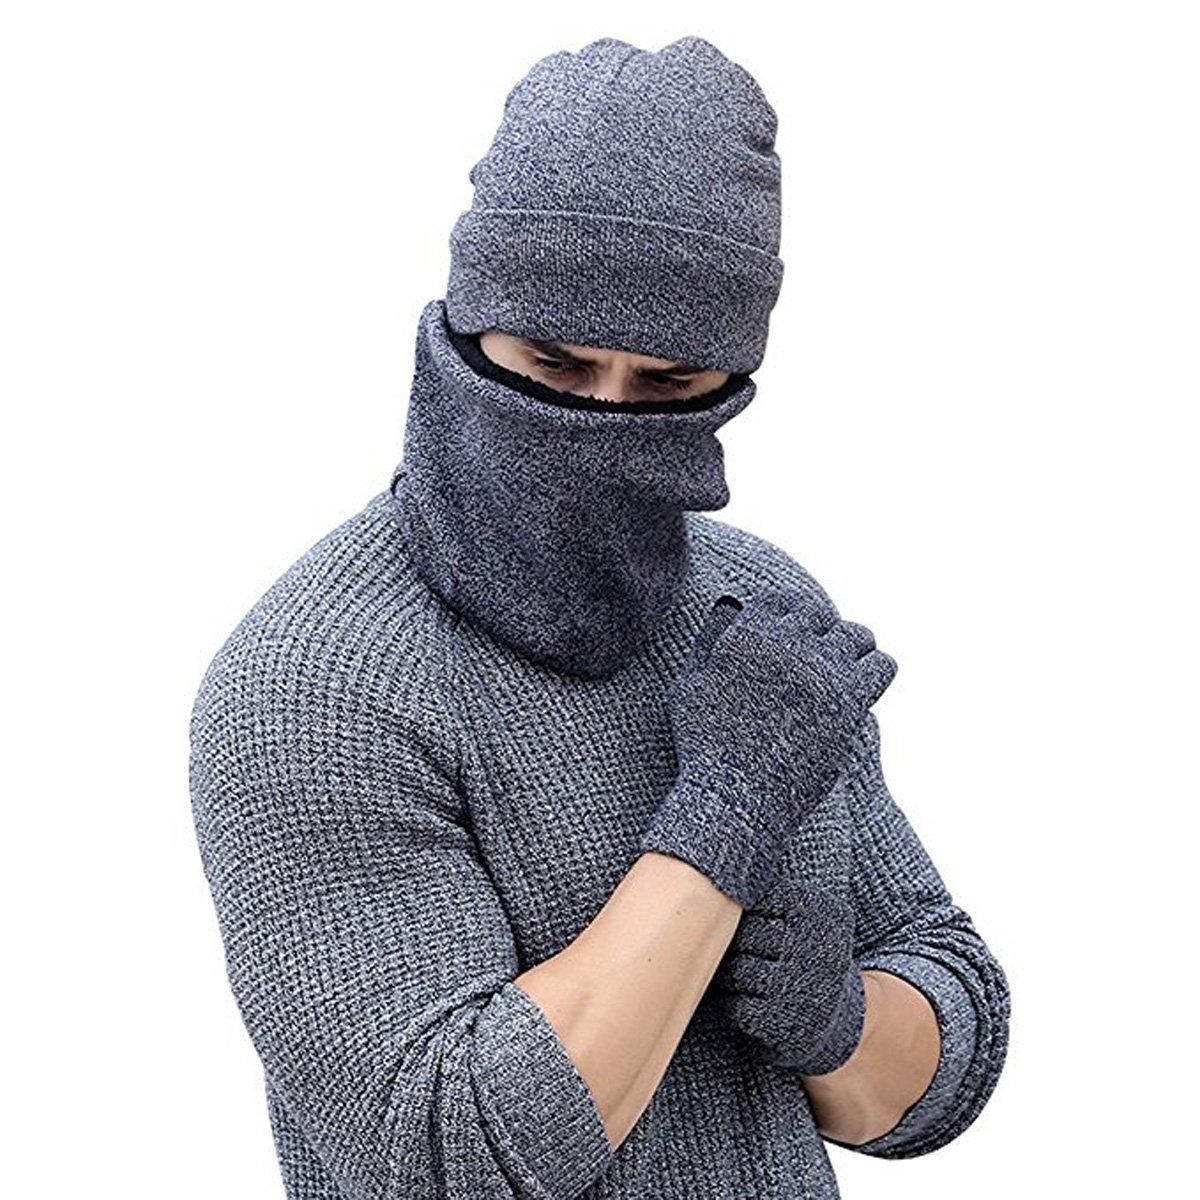 ARNIYA Winter Warm Knit Hat+Scarf+Touch Screen Gloves ,Unisex 3 Pieces Knitted Set